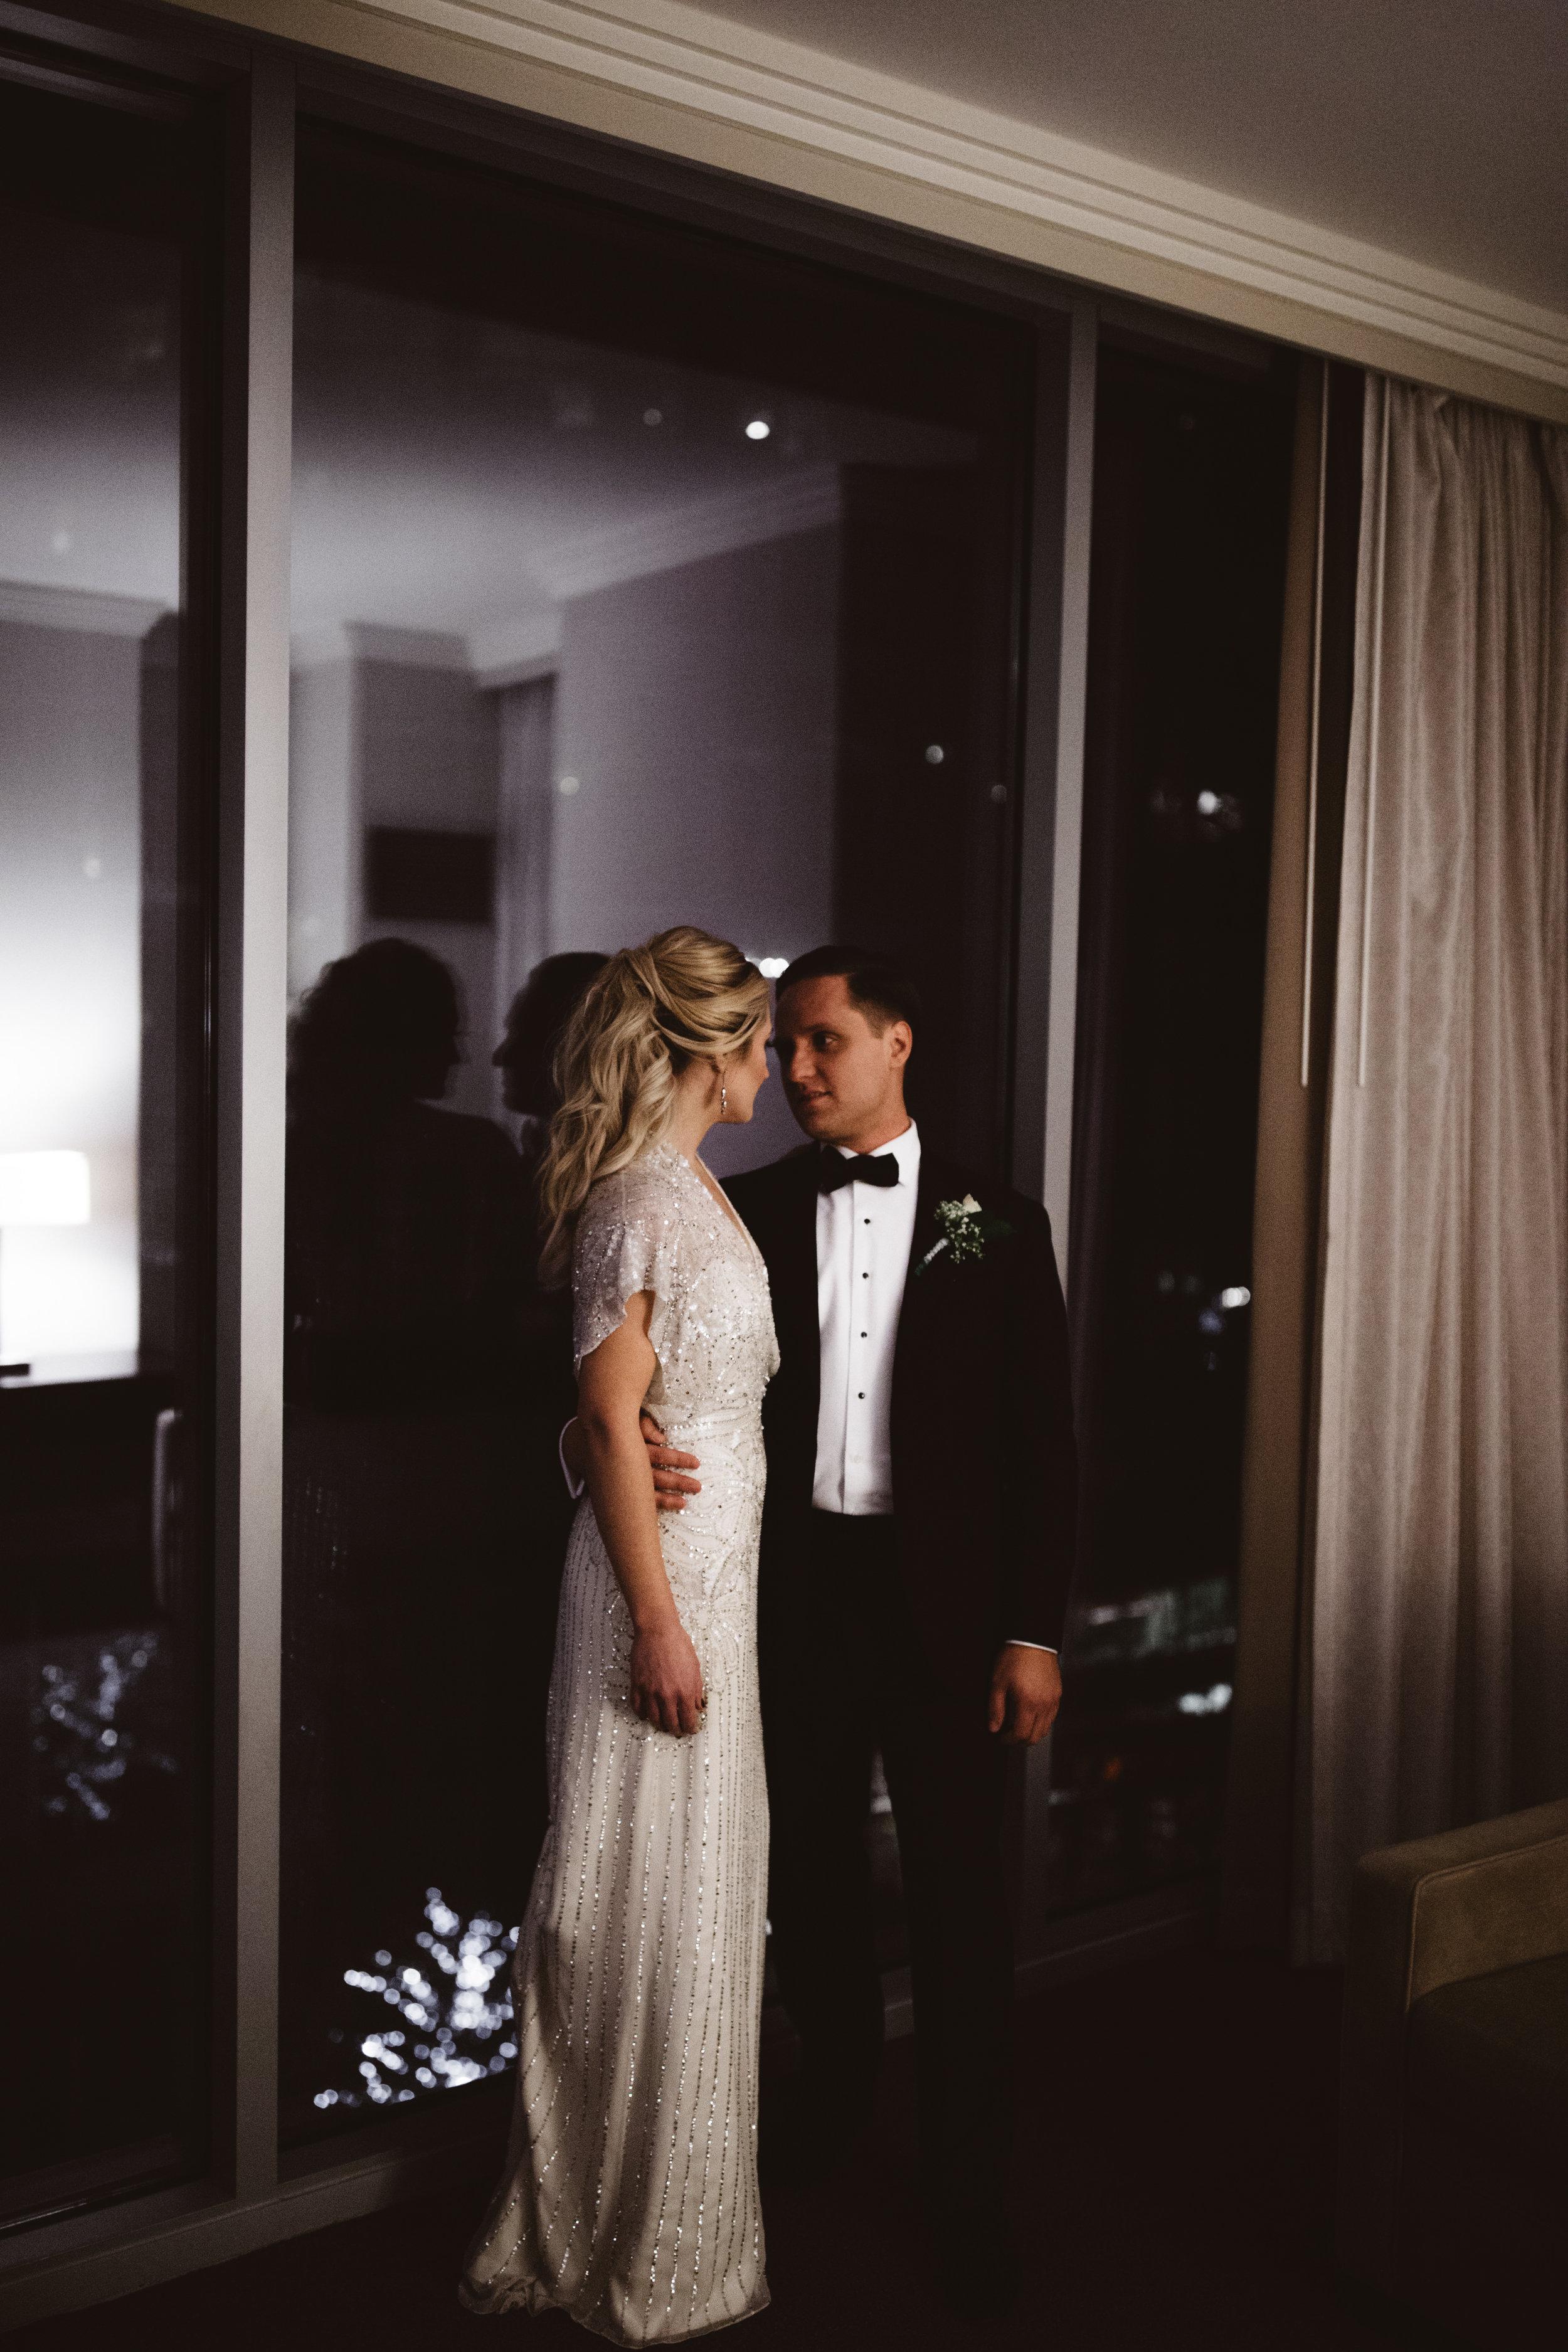 Mattie Bell Photography- Kelly & Zack Wedding Atlanta Brewery -272.jpg